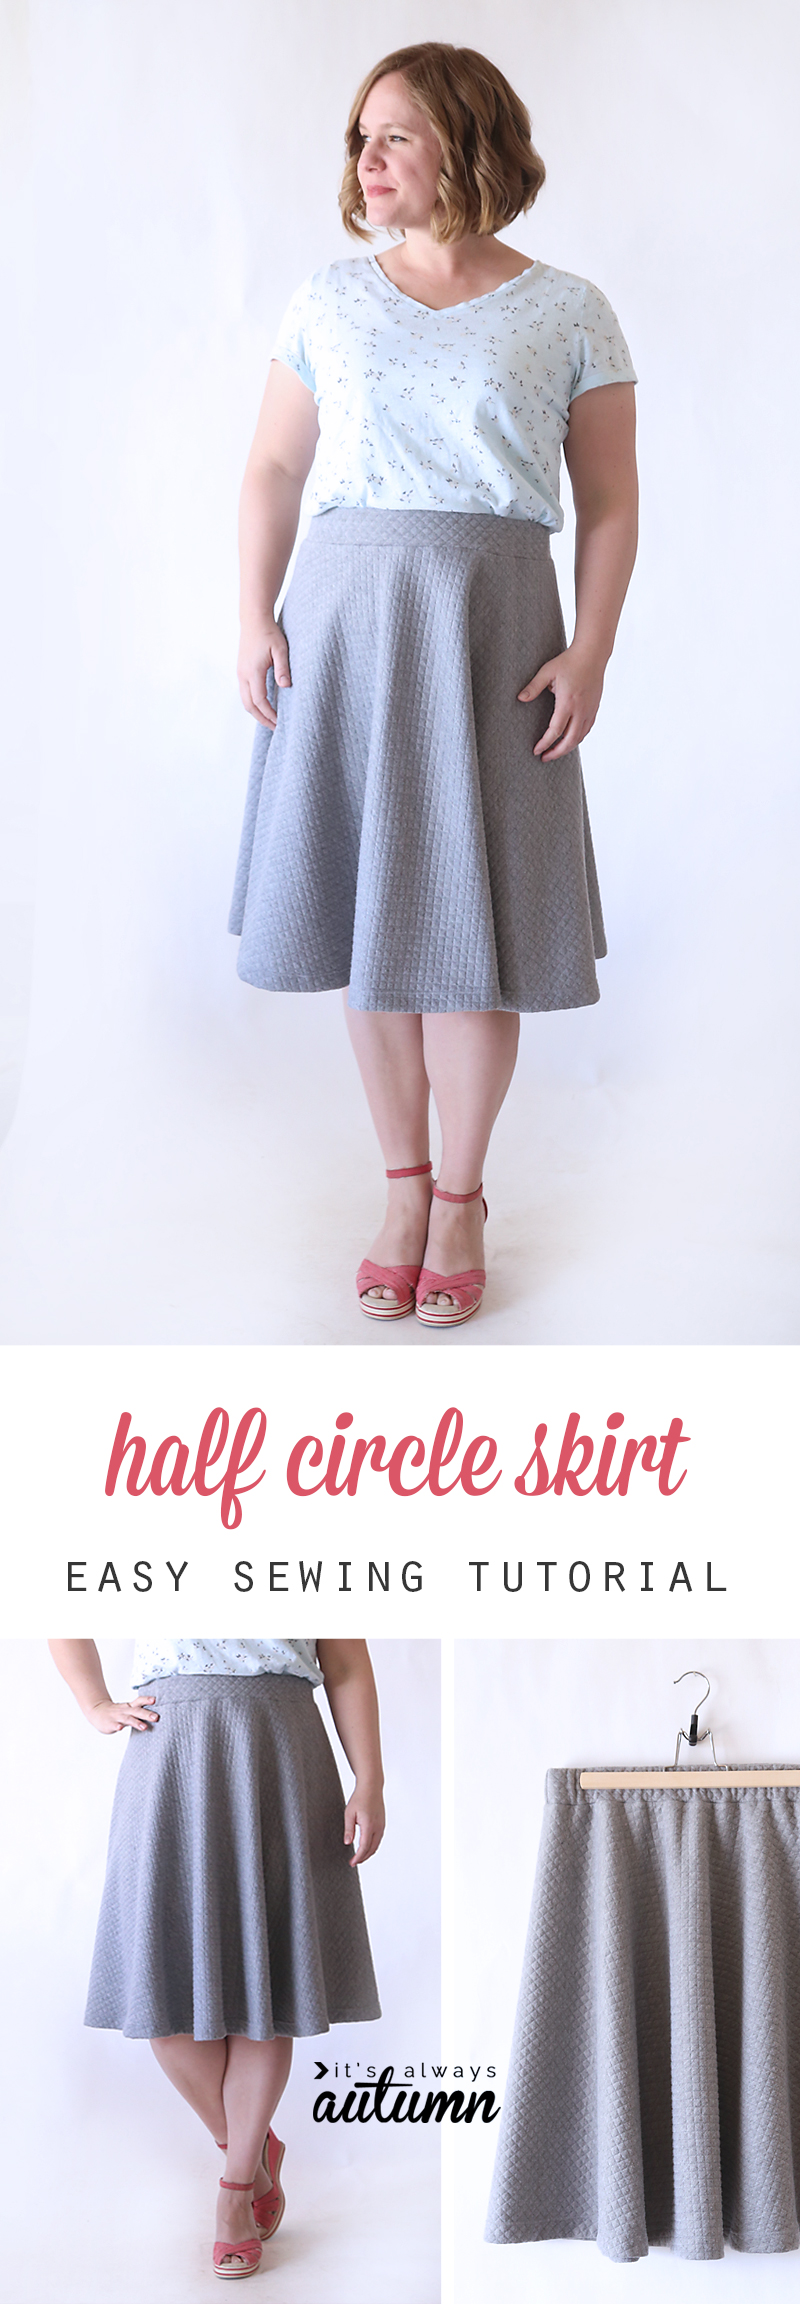 easy half circle skirt sewing tutorial - It's Always Autumn